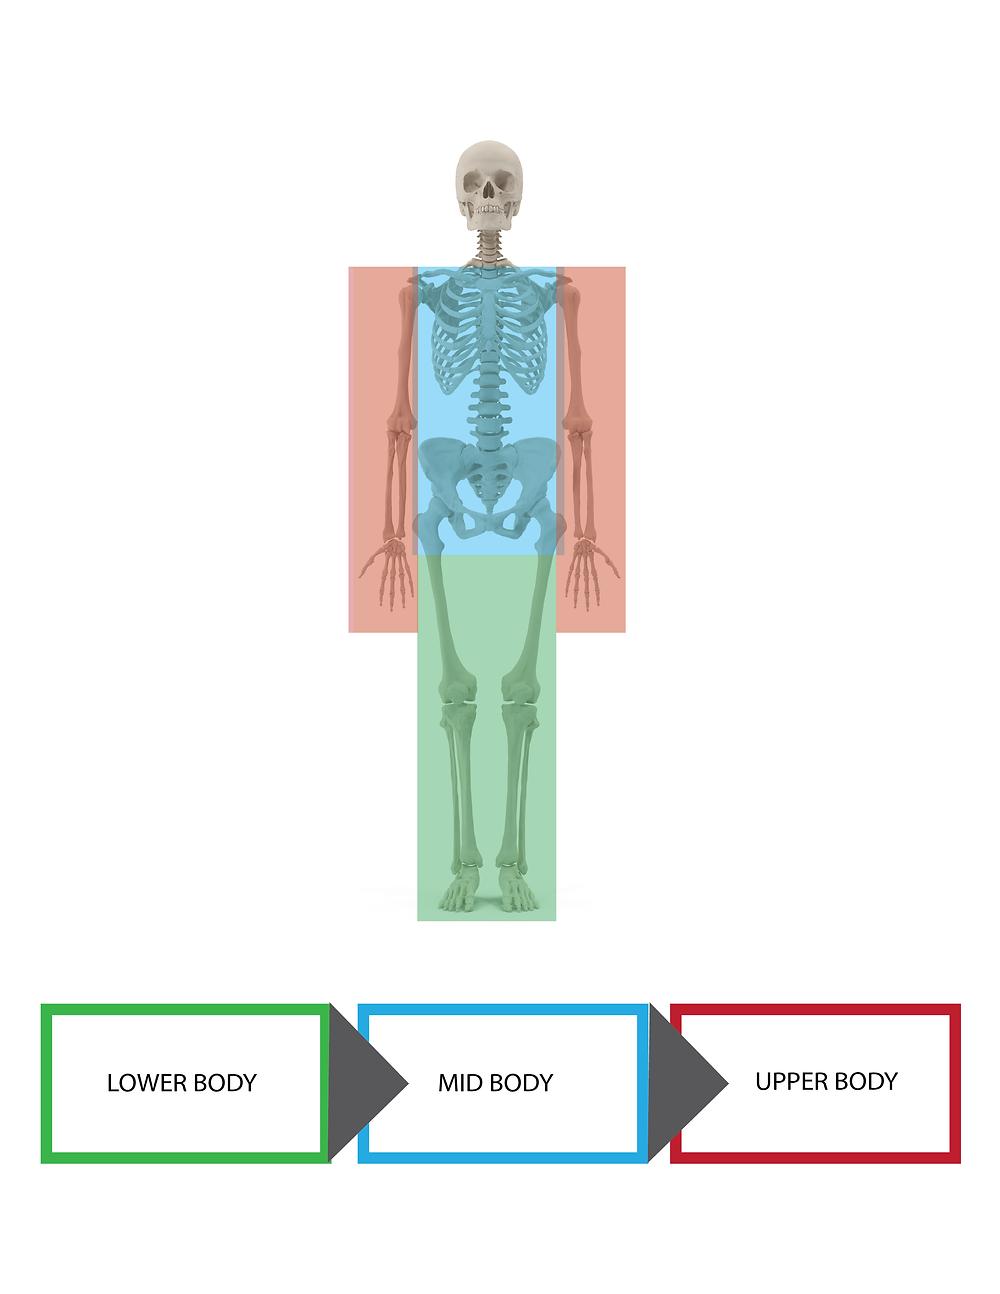 musculature, anatomy, body sub groups, kinesiology, biomechanics,